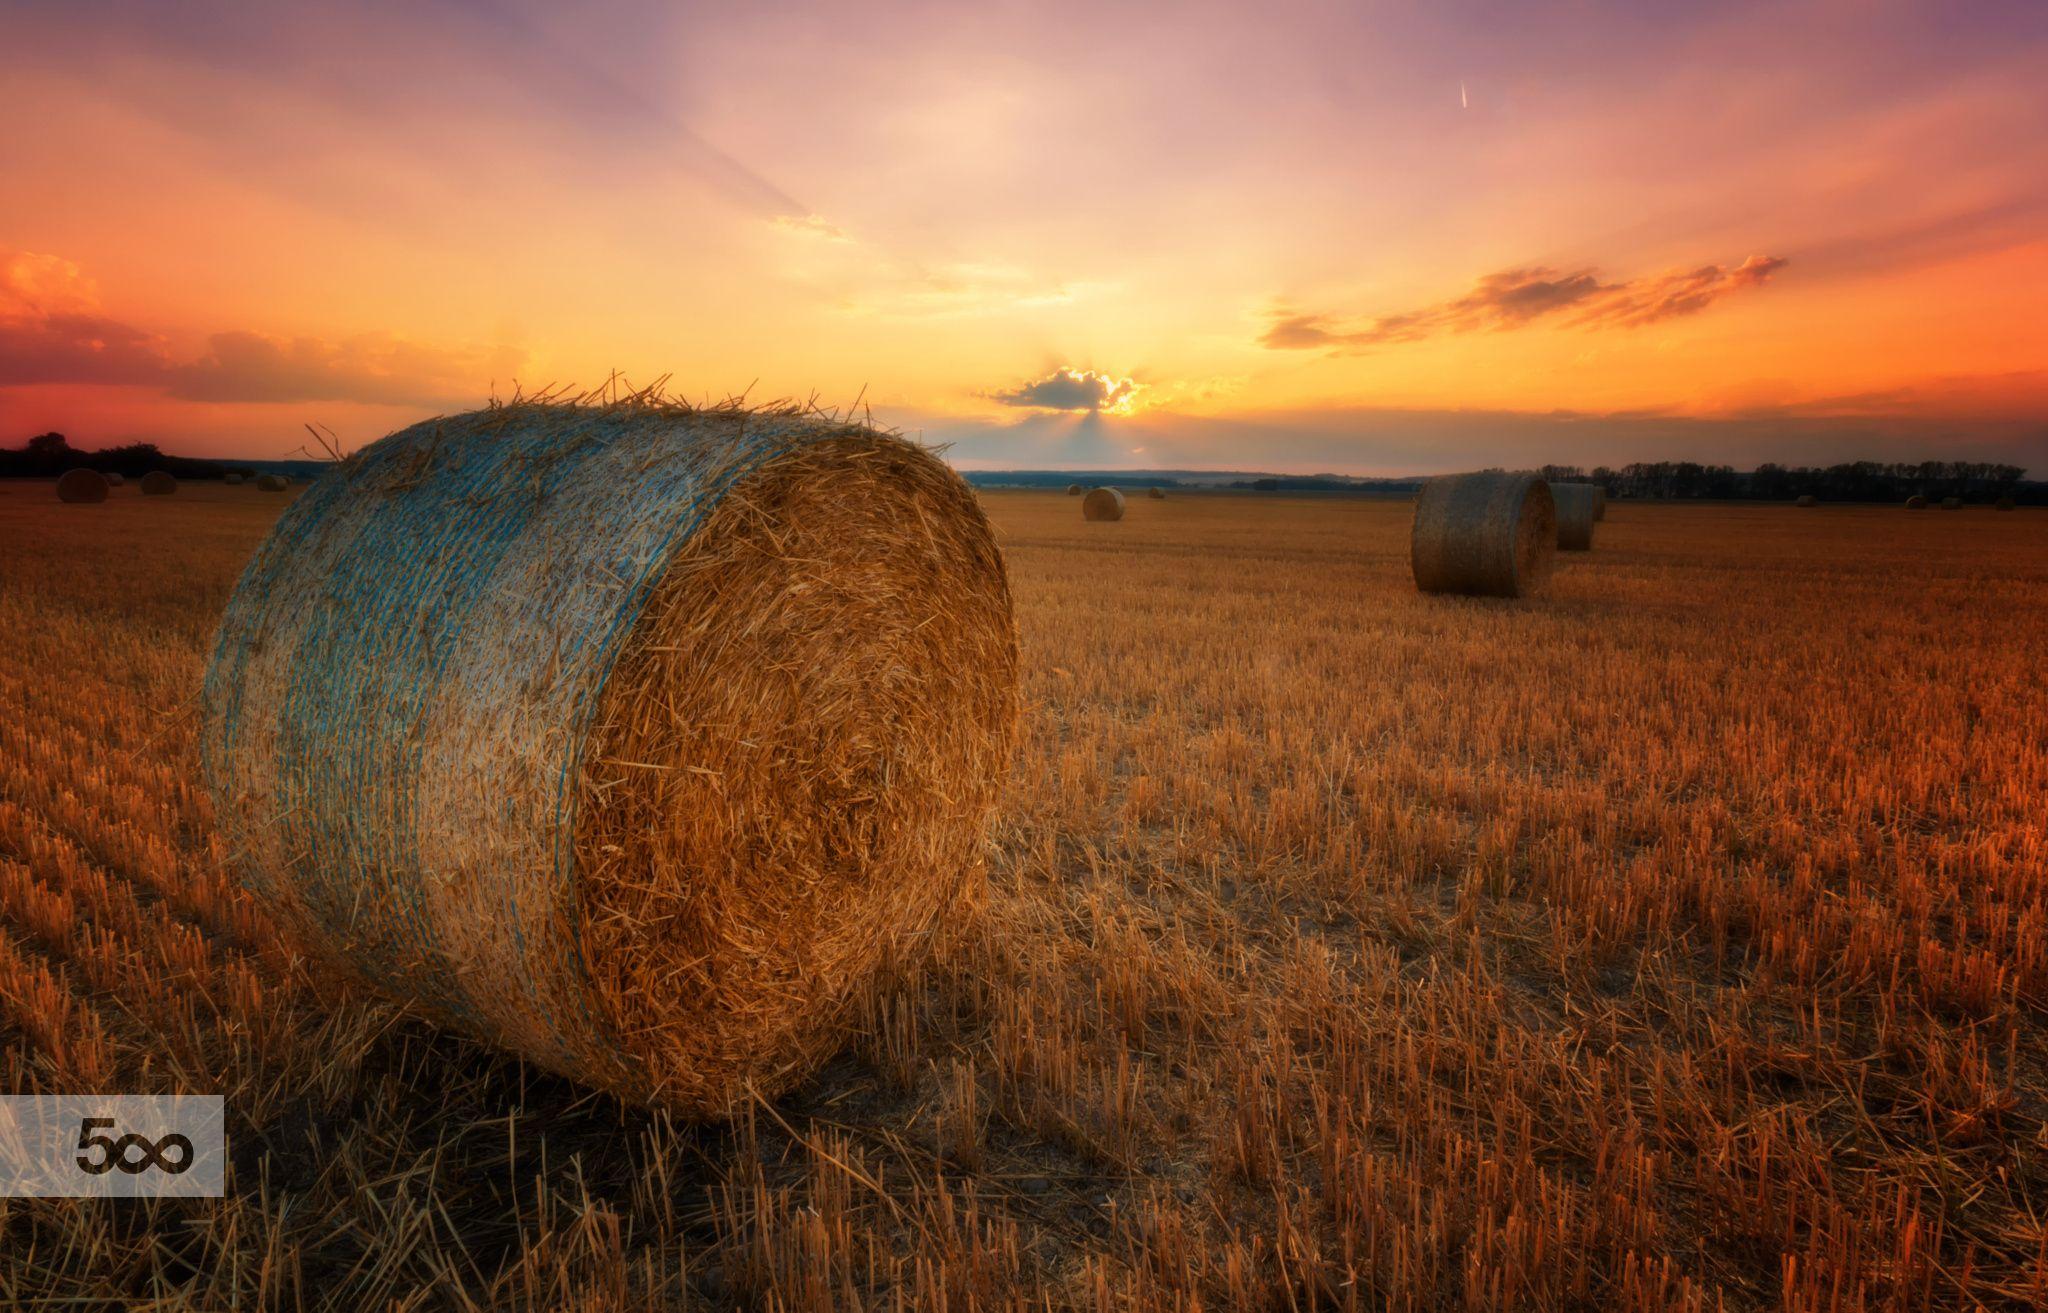 Good bye, summer by Petr Kubát on 500px